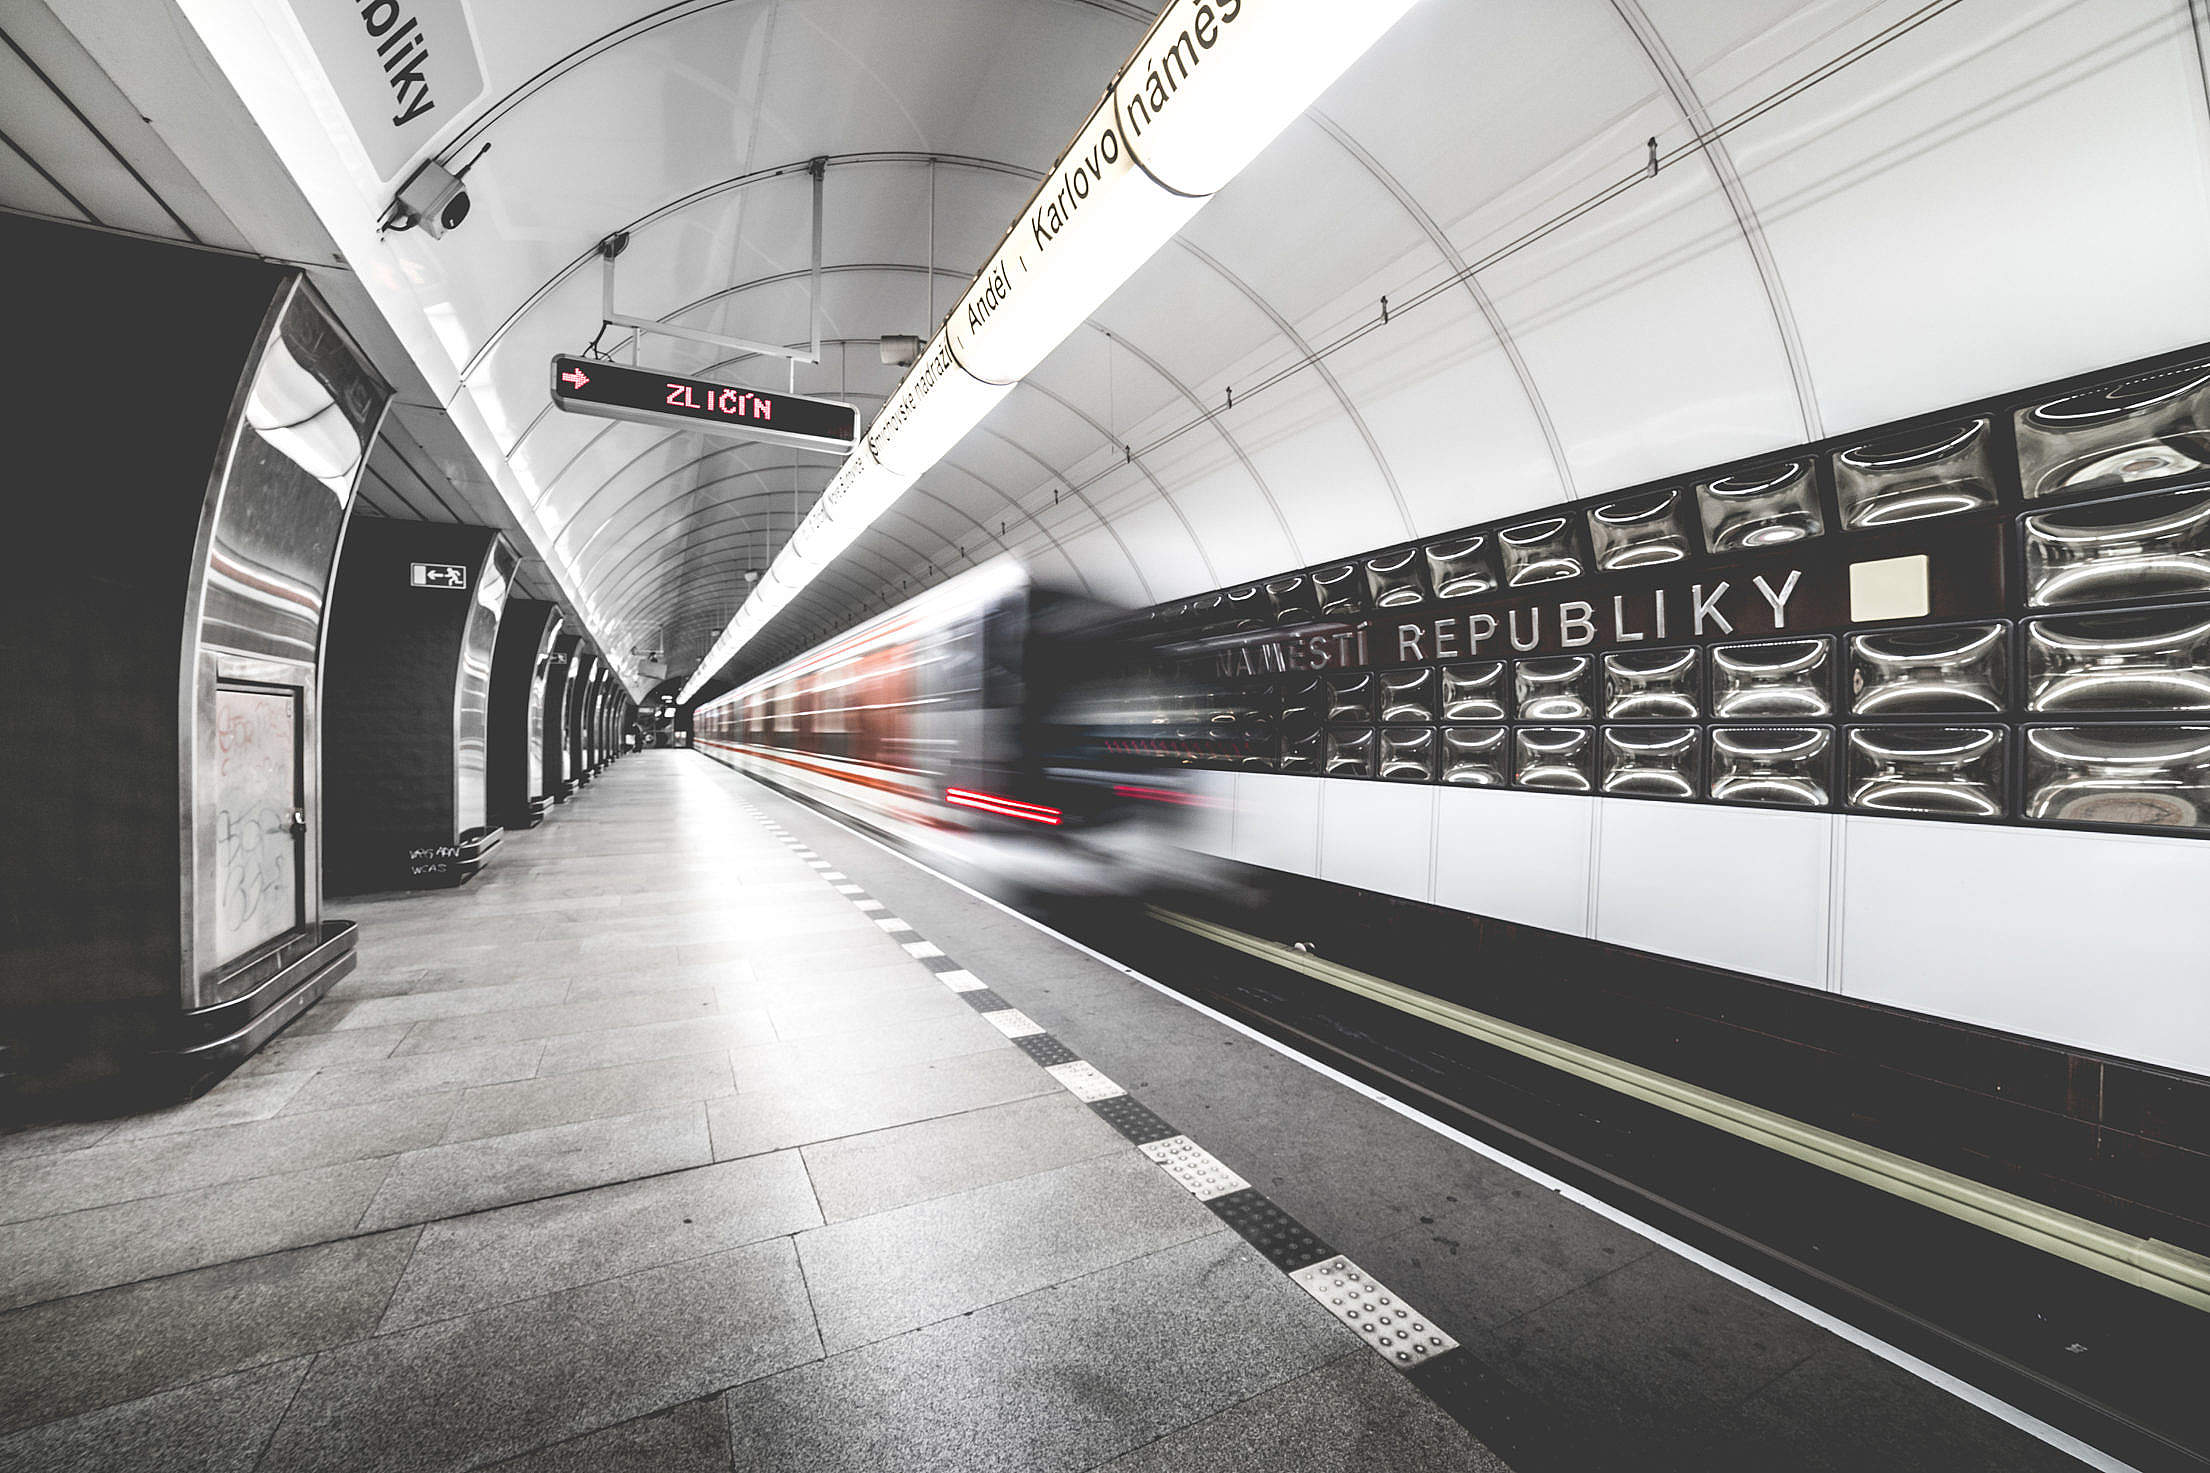 Prague Metro Subway Public Transport Station Free Stock Photo